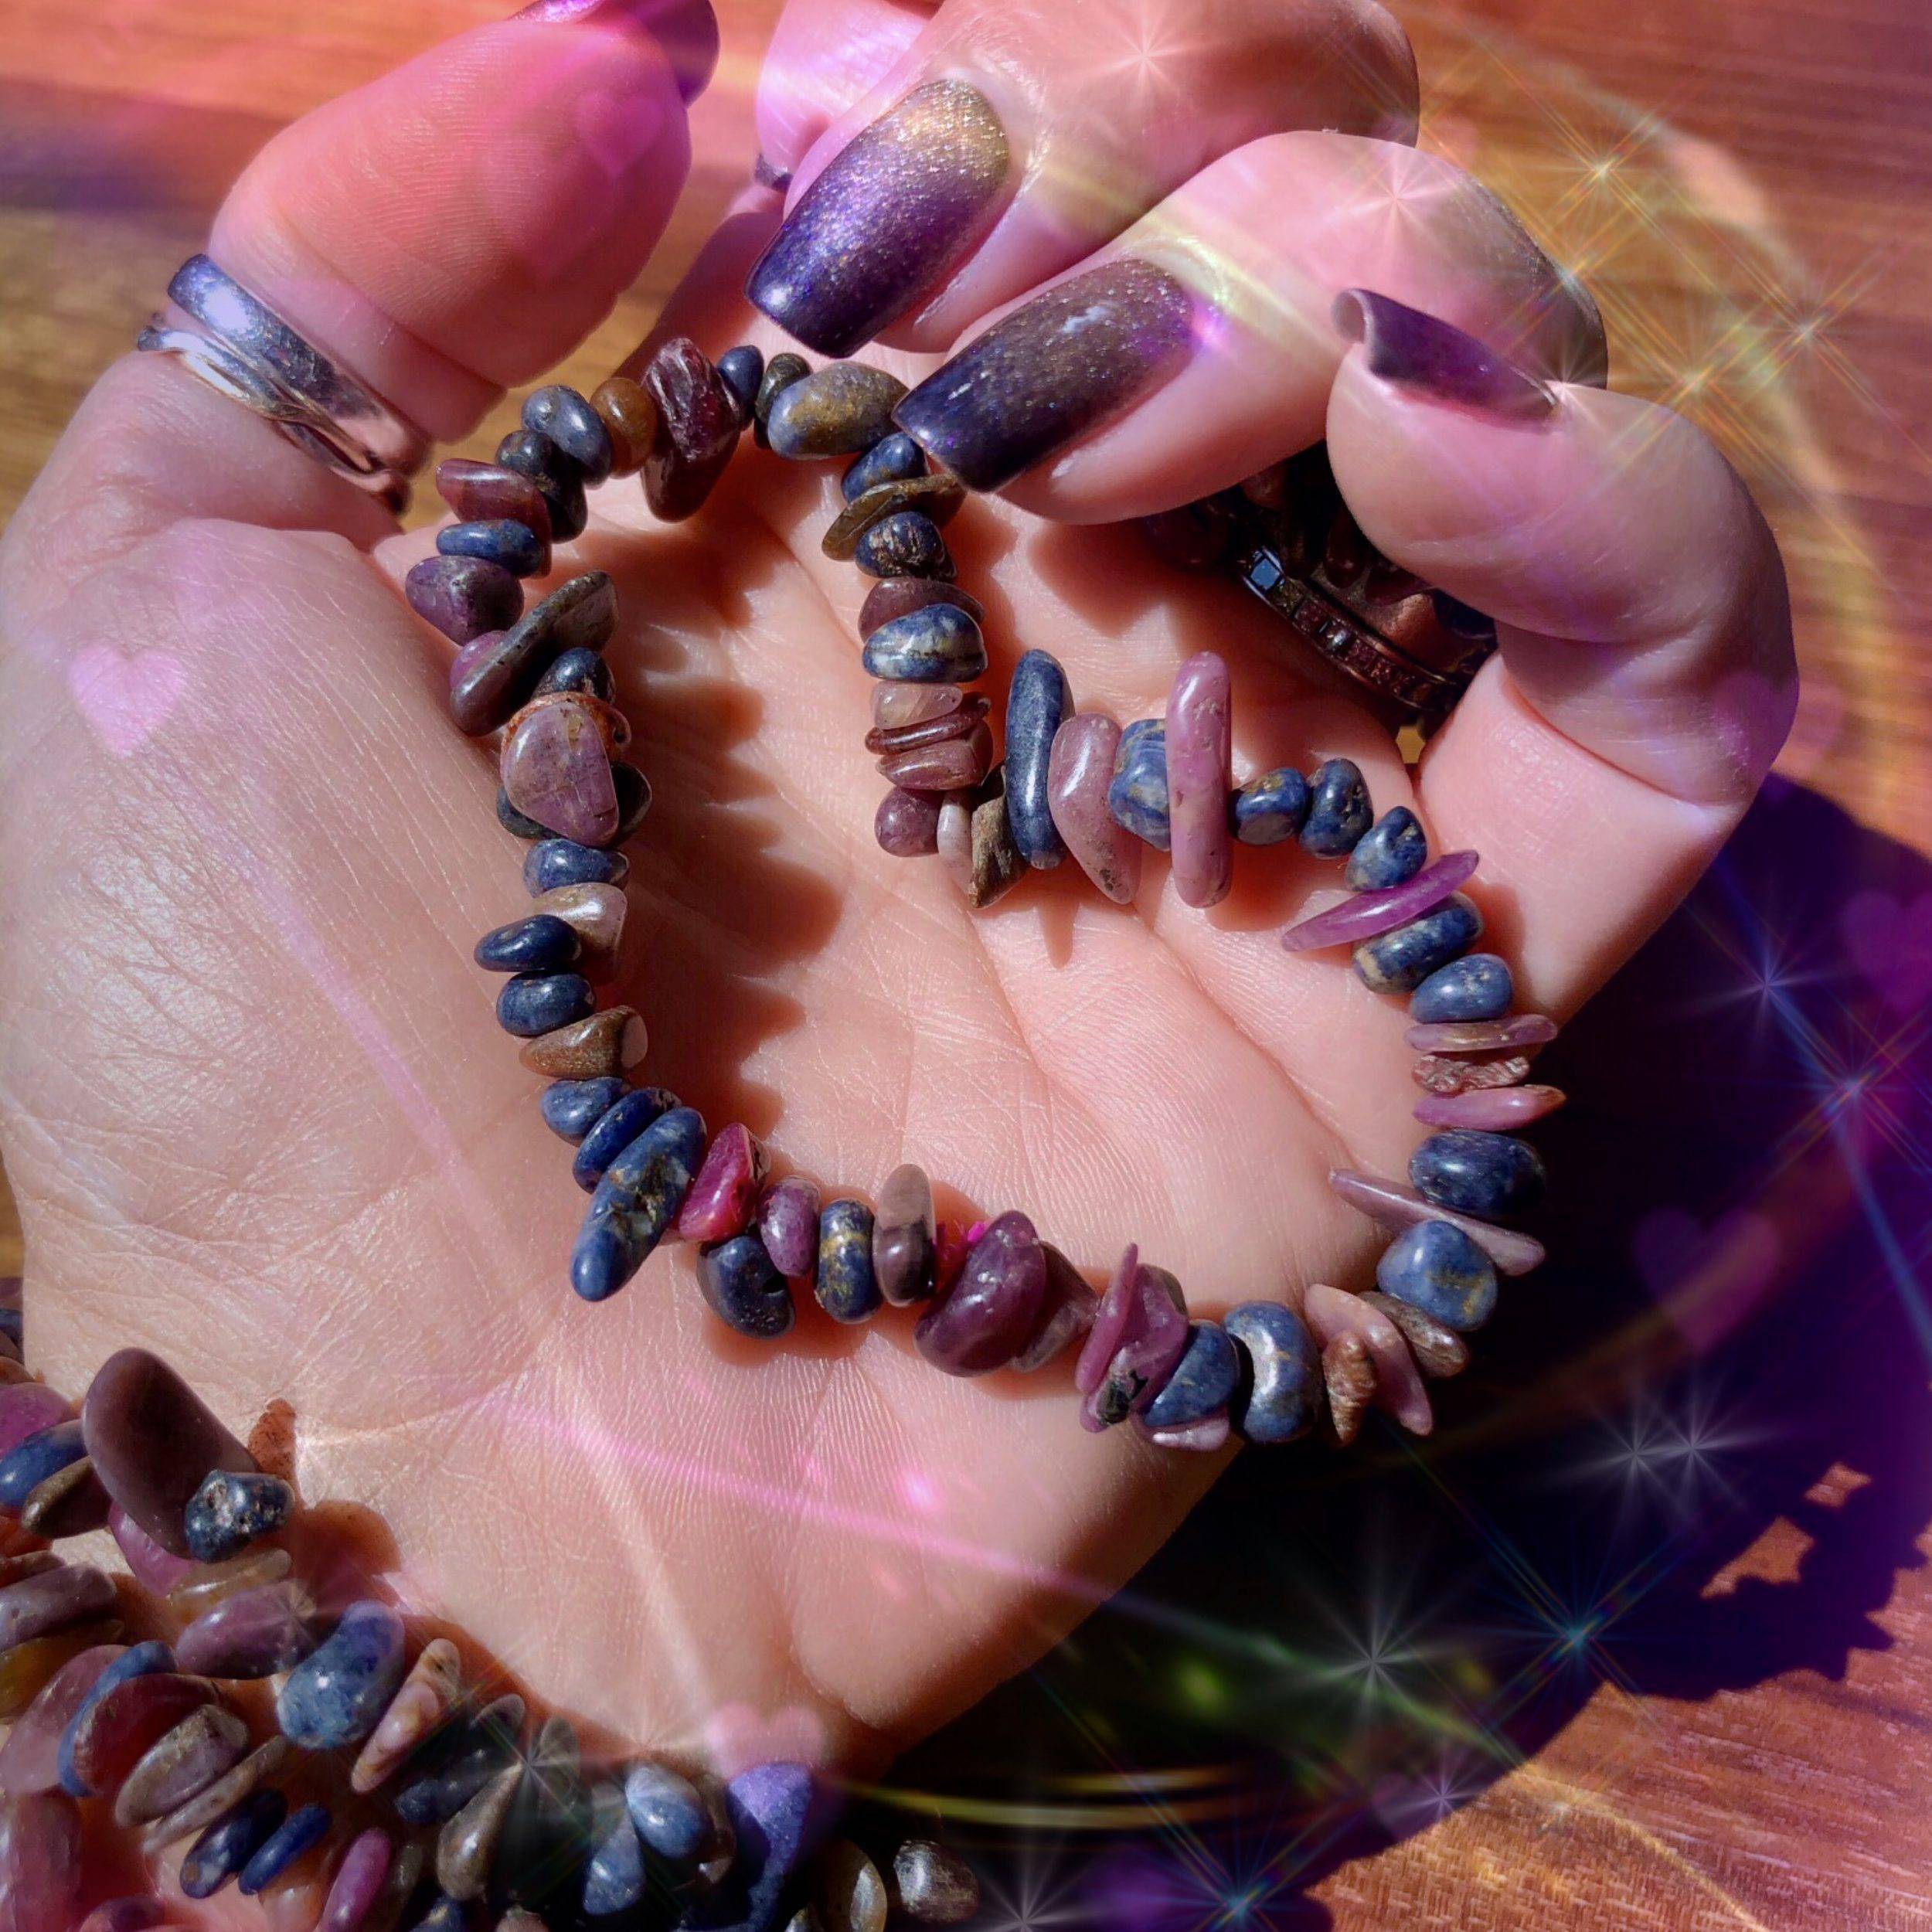 Ruby_and_sapphire_Denver_after_dark_bracelets_1of2_9_12